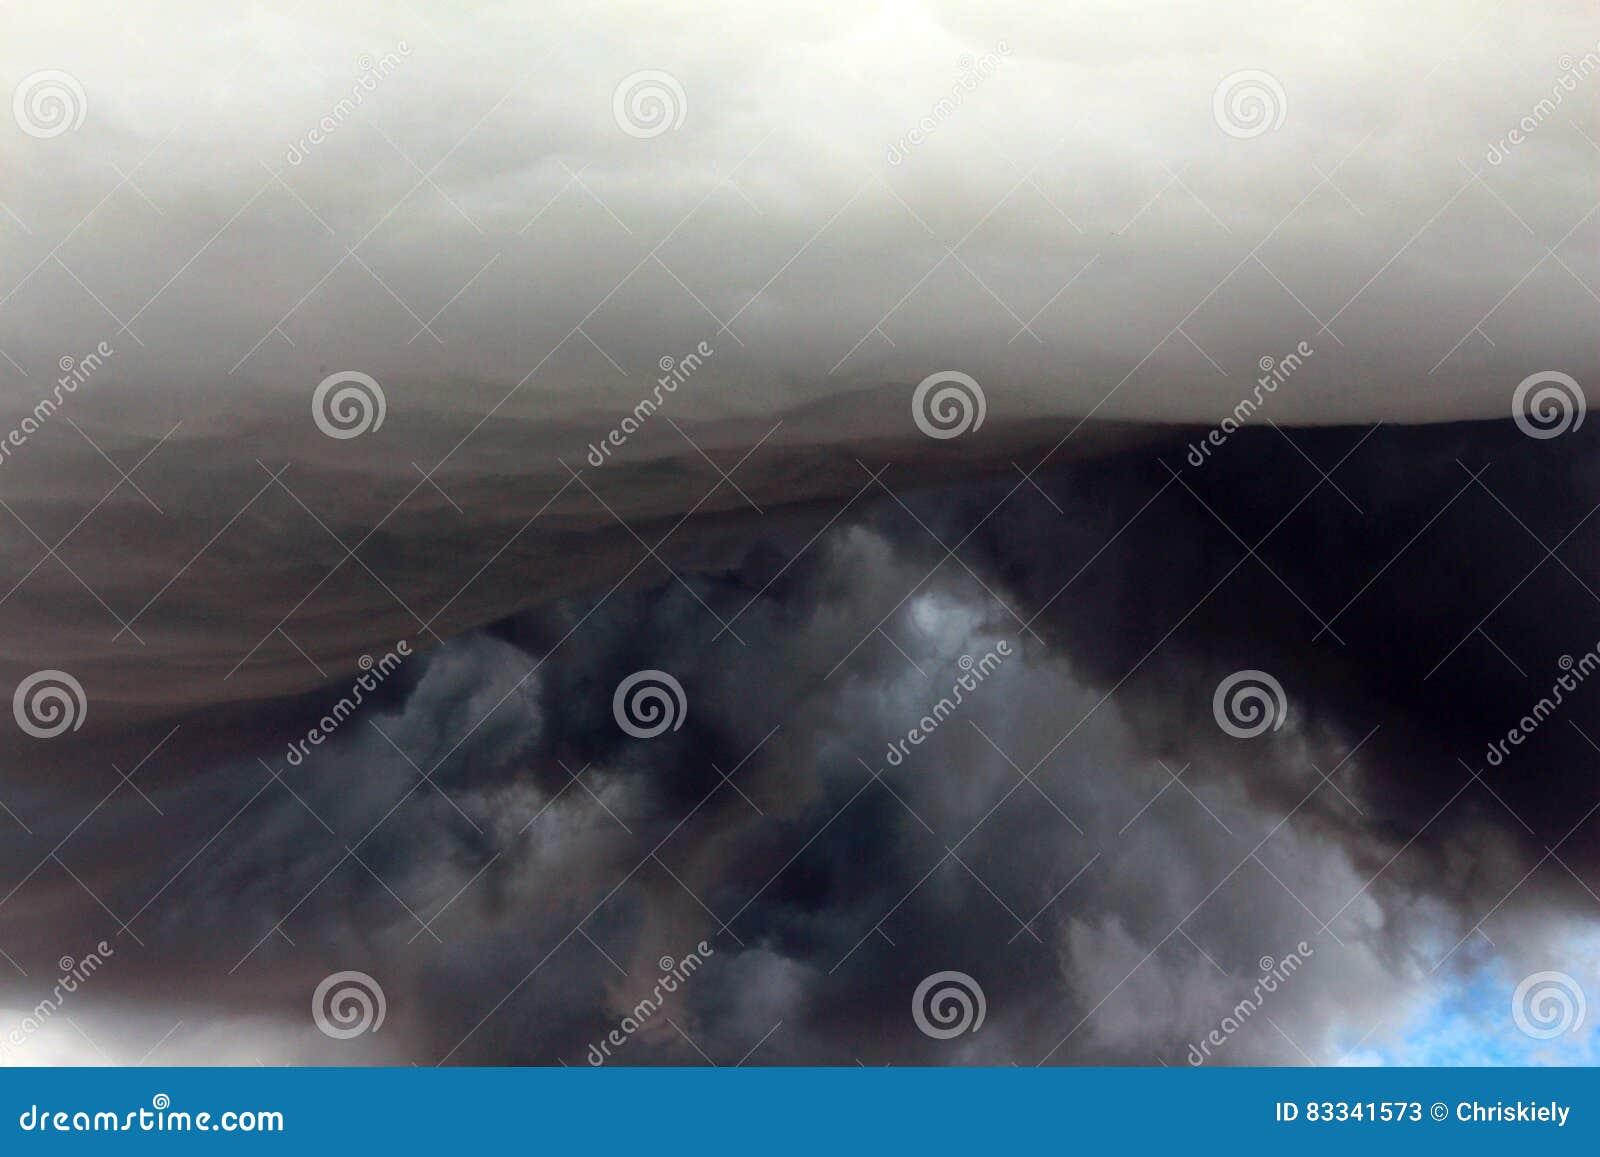 Unusual Clouds: Mammatus